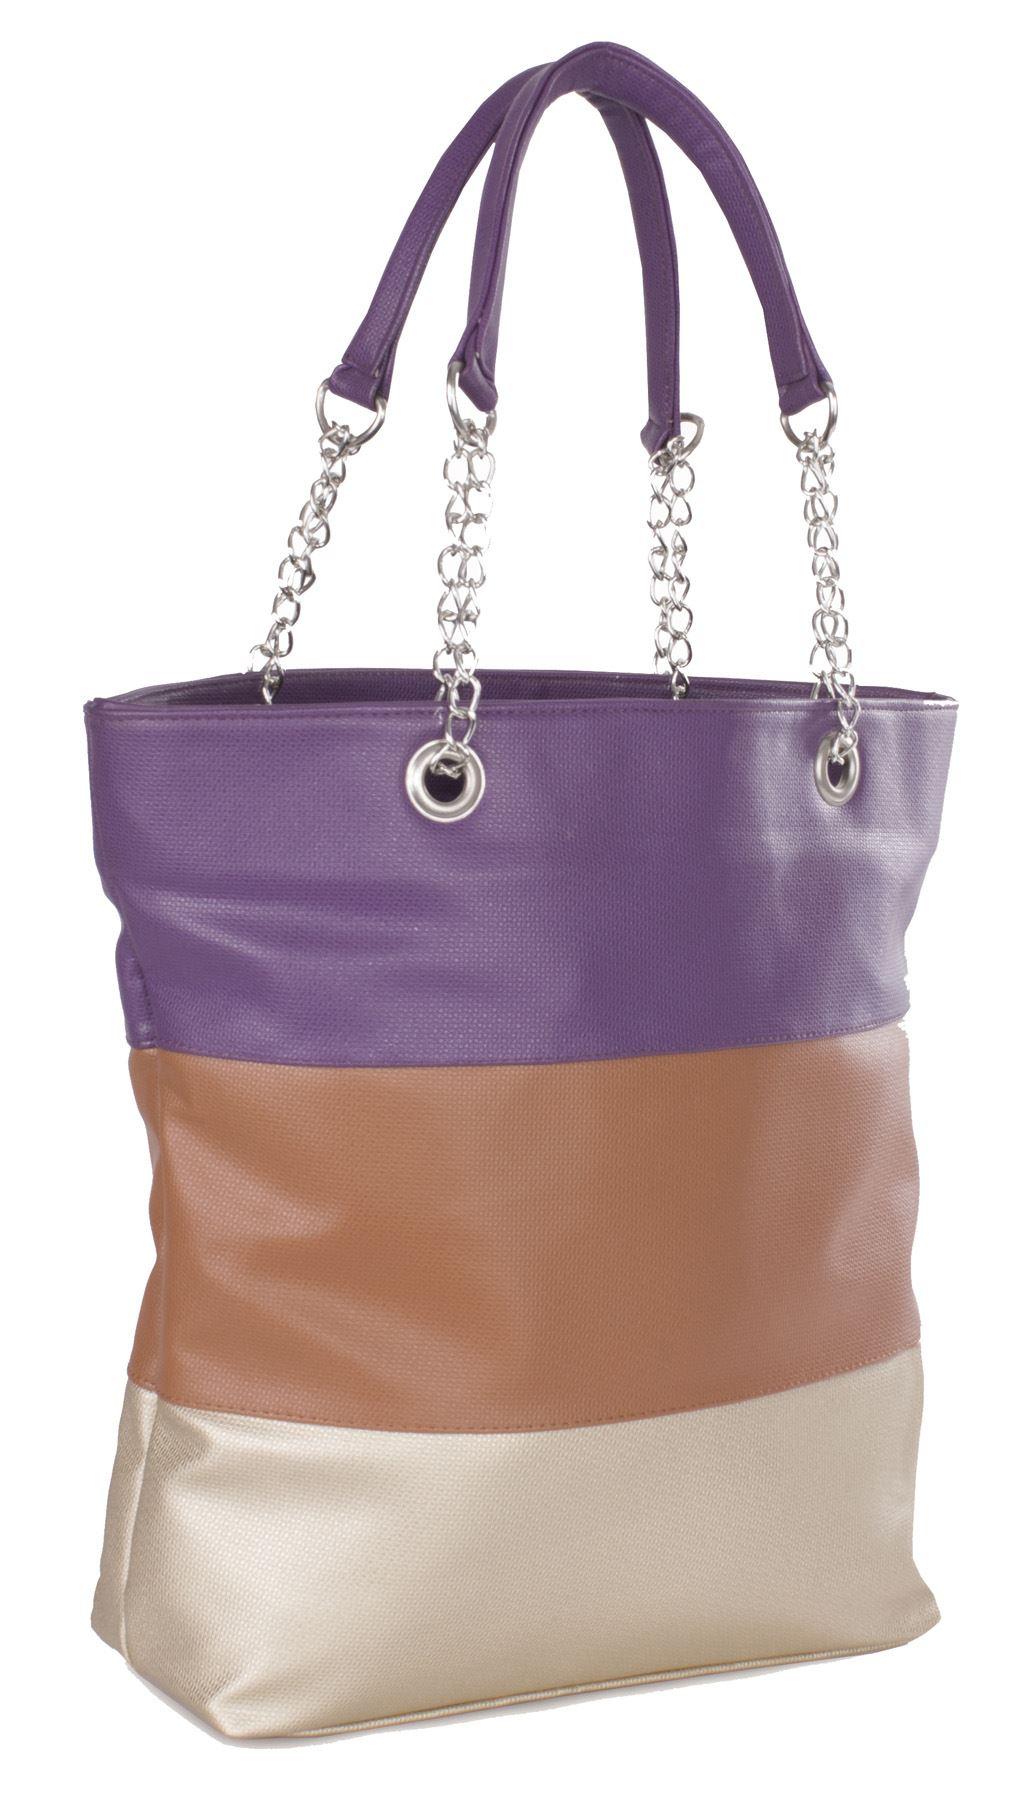 75ee8ed31696 Big Handbag Shop Women Multi Colour Hobo Chain Linked Top .